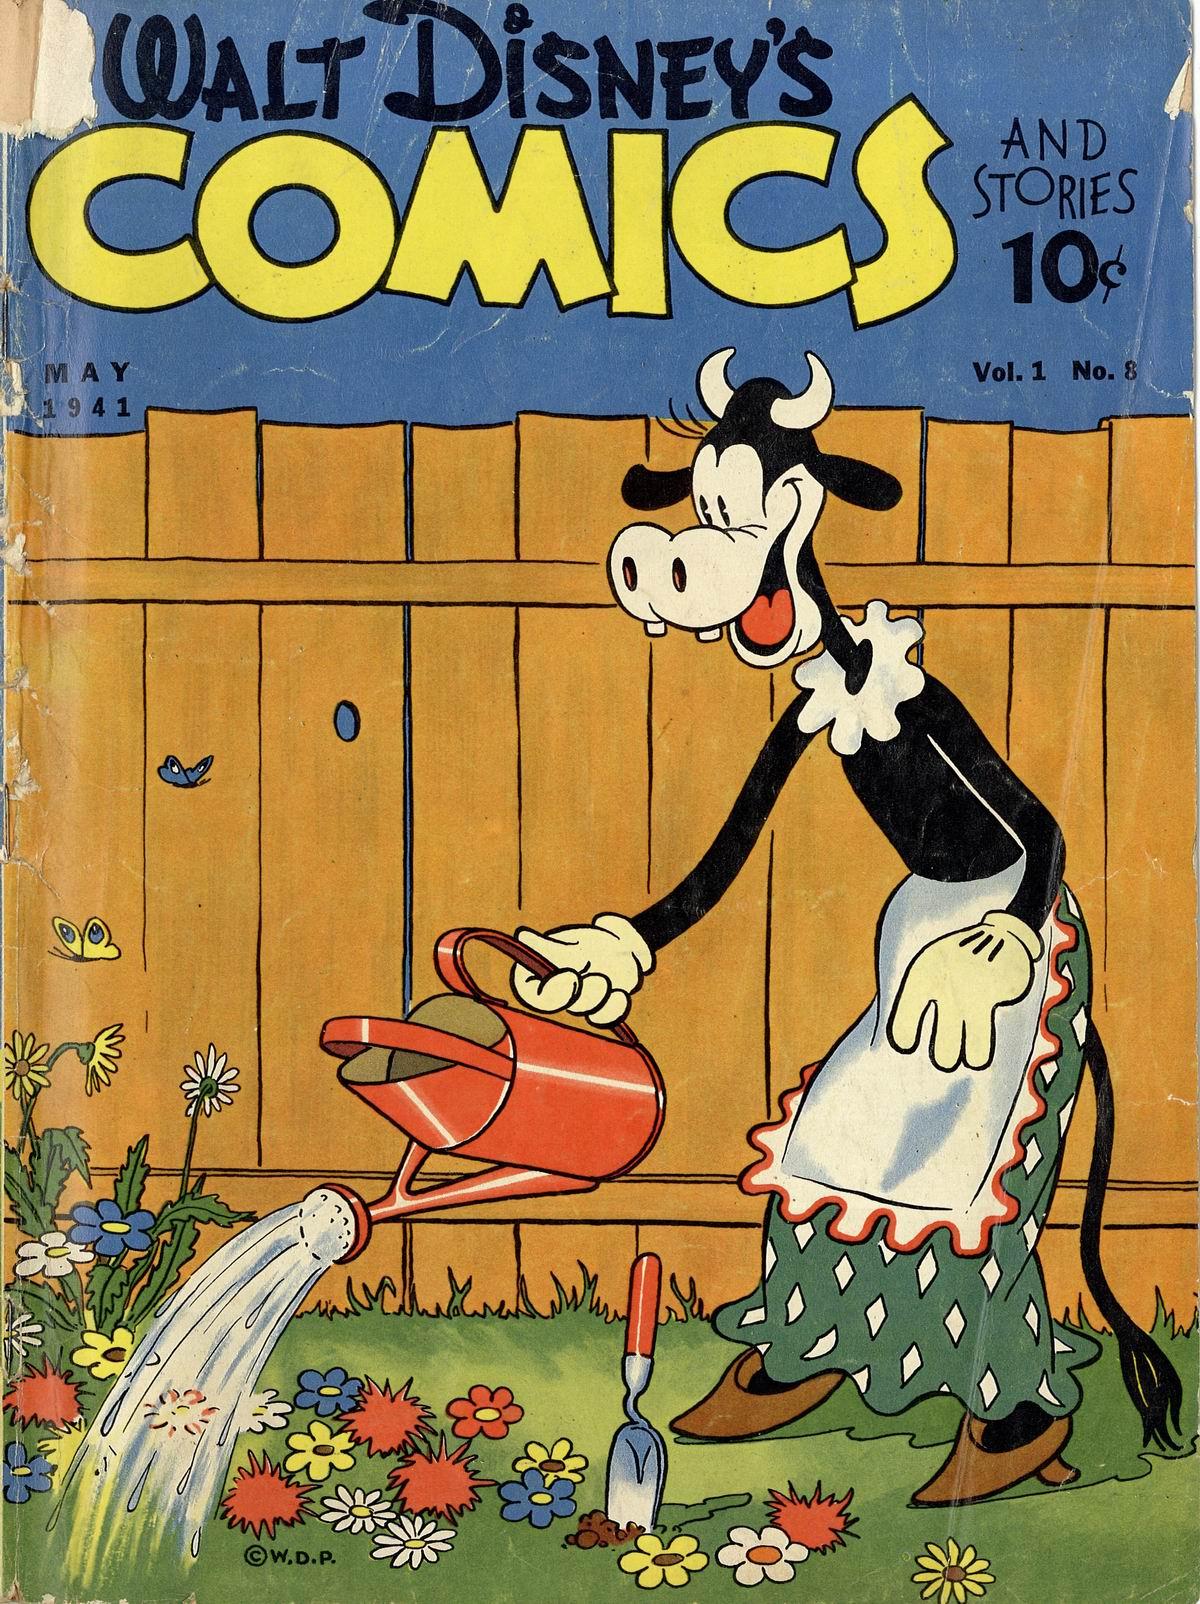 Walt Disneys Comics and Stories 8 Page 1